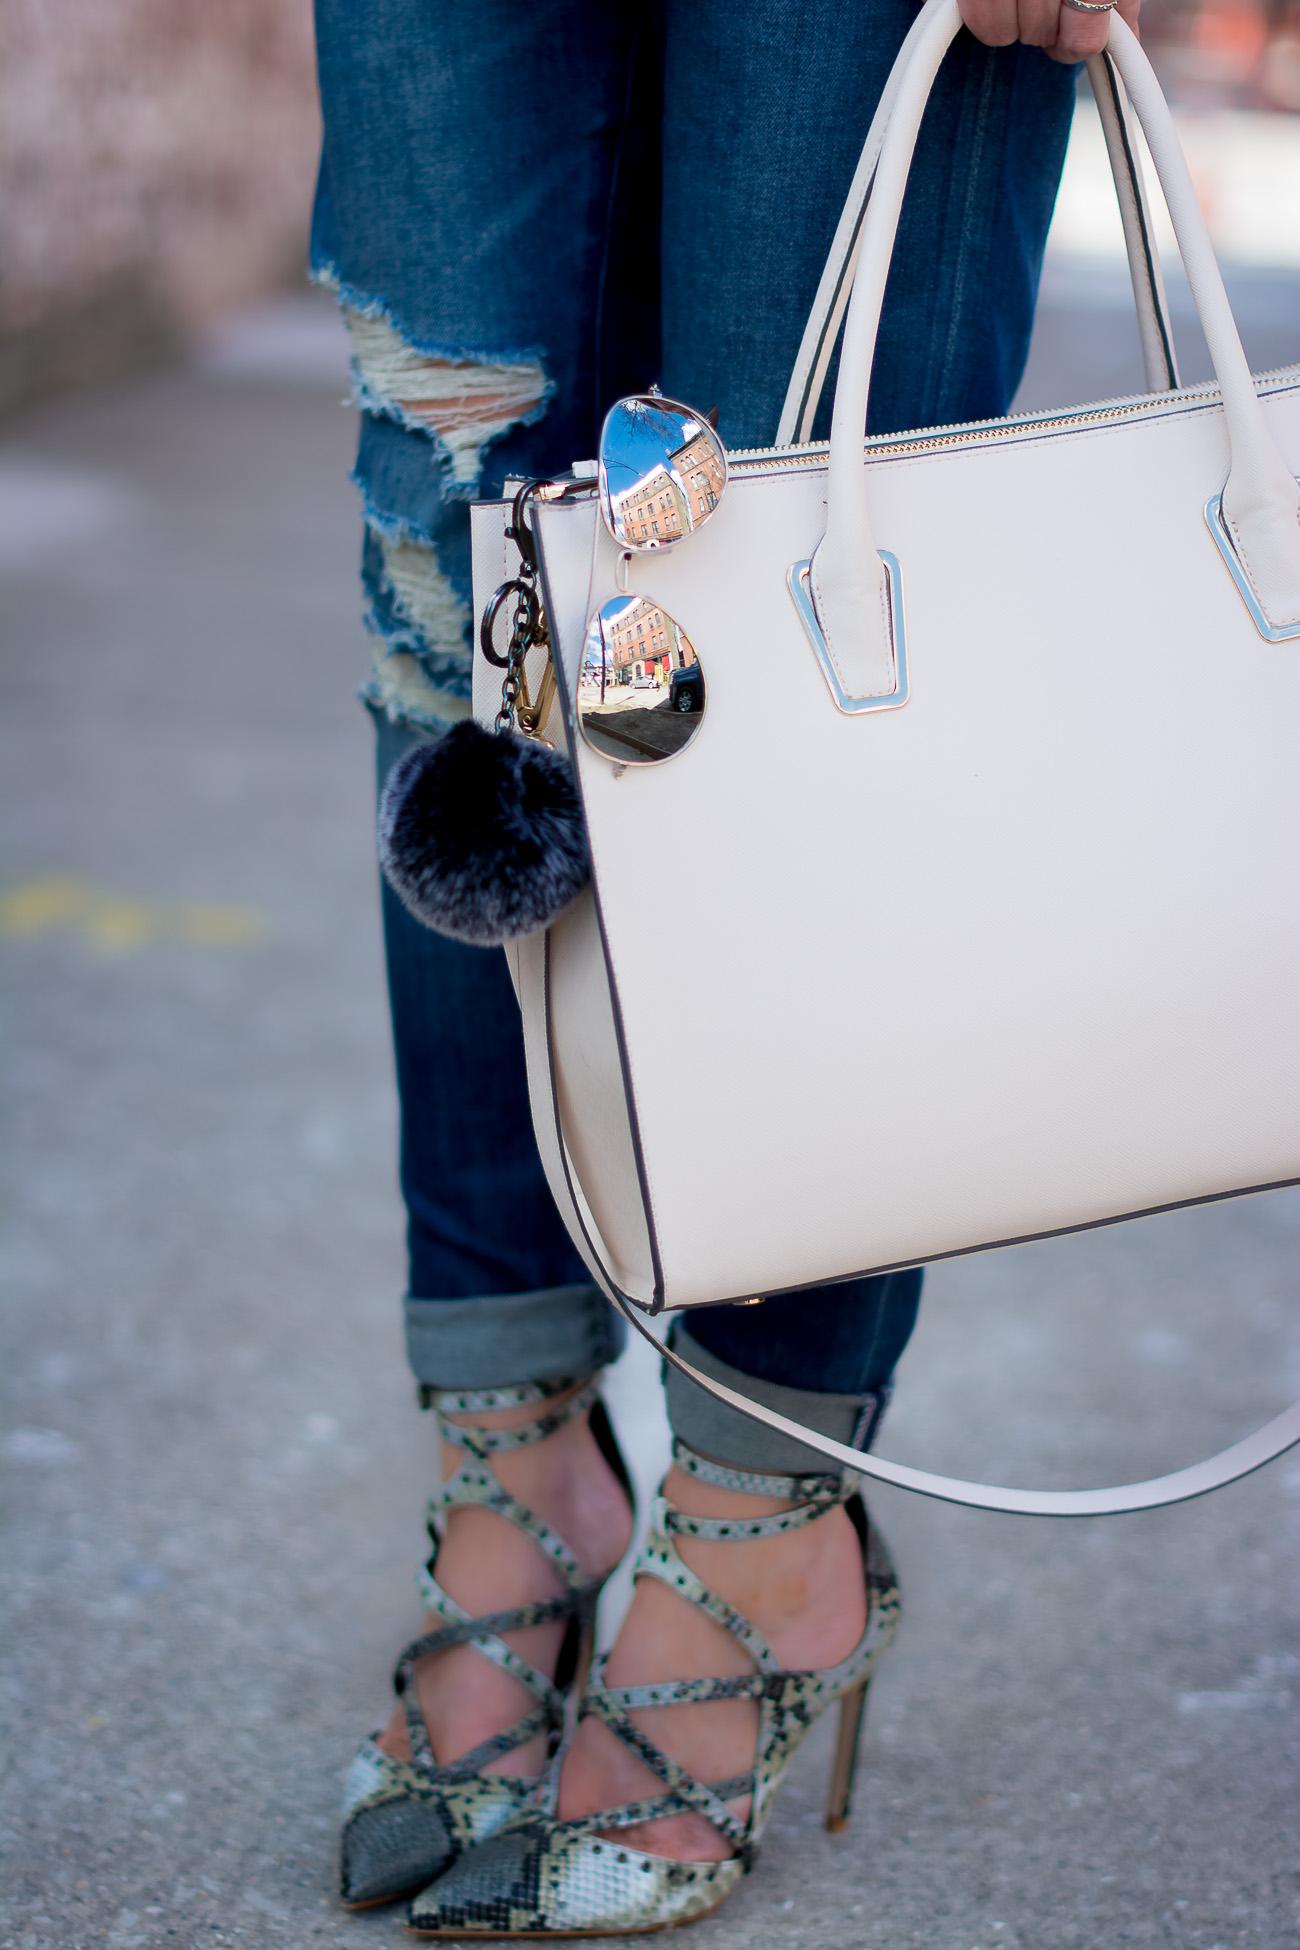 how-blogging-changed-my-life-distressed-boyfriend-jeans-snakeskin-heels-blush-tote-mirrored-aviators